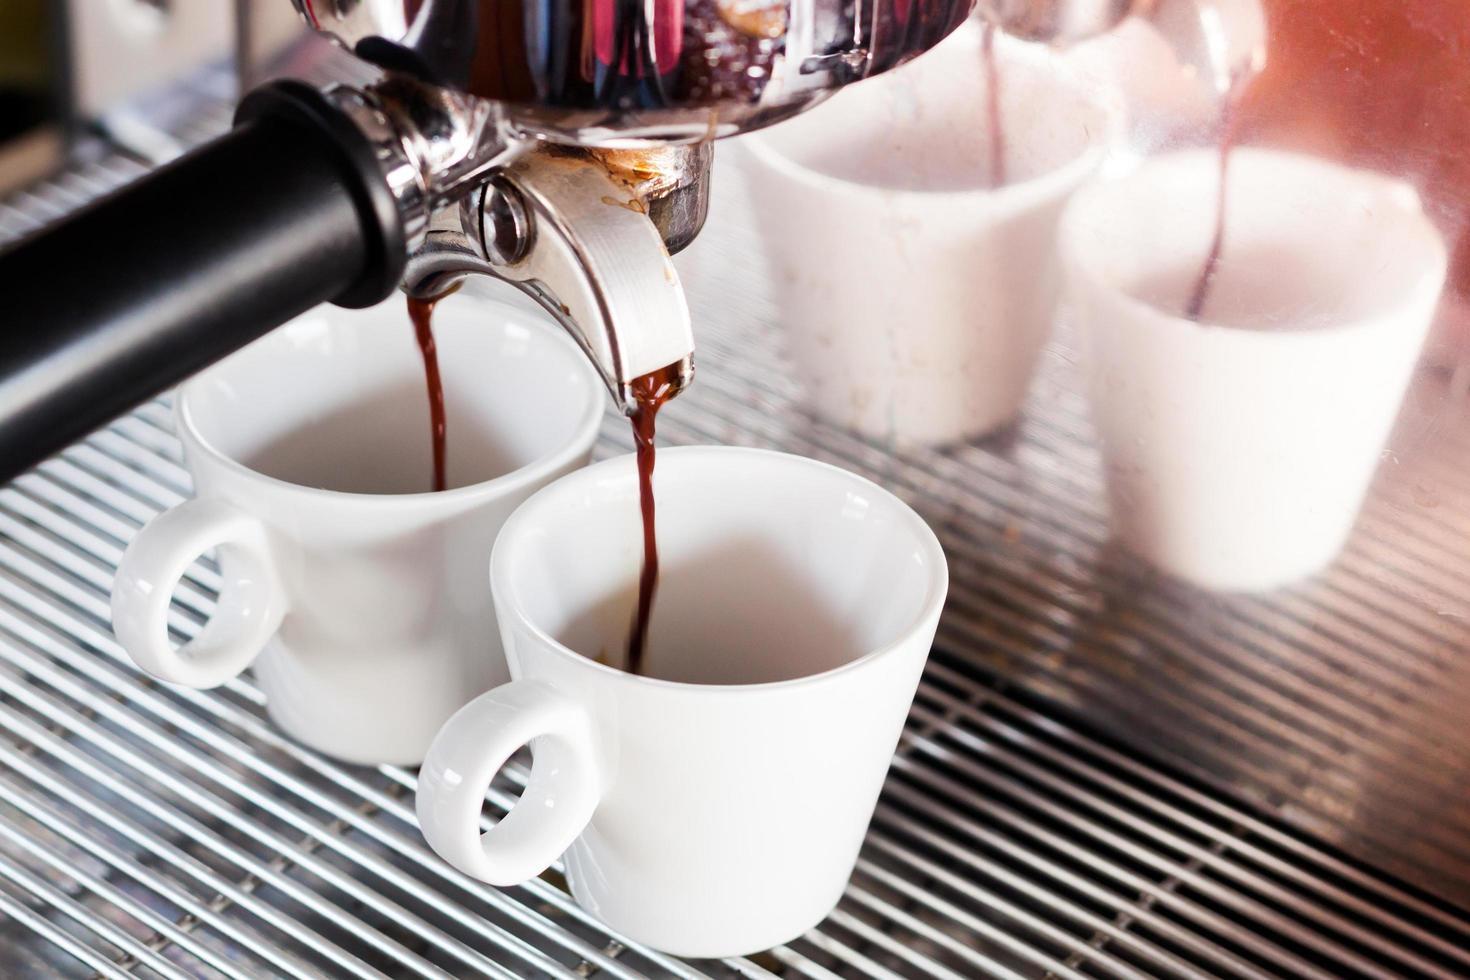 Espresso shots being poured photo